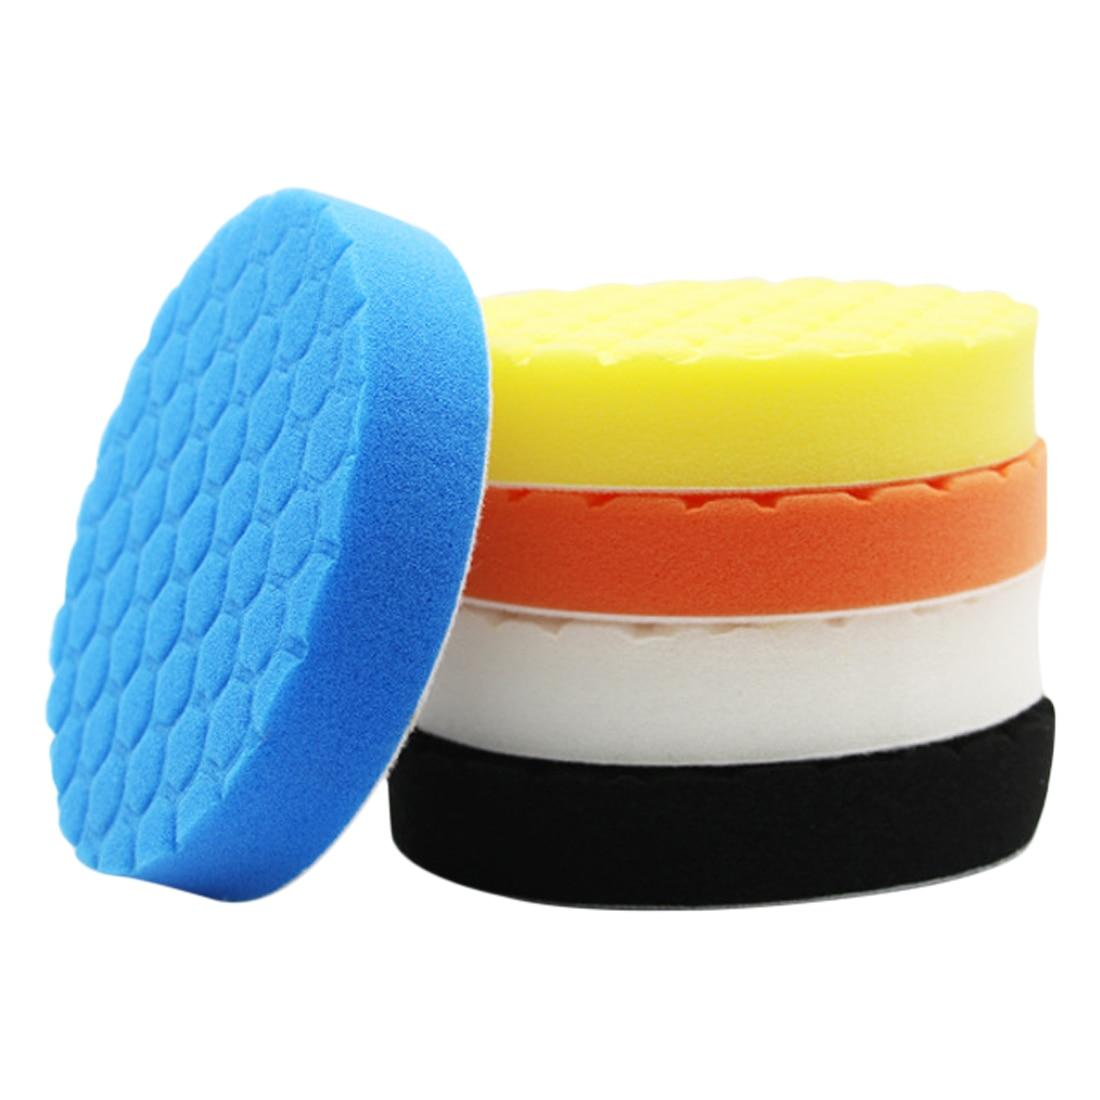 Buffing Sponge Polishing Pad Kit Set 3pcs 3/4/5/6/7inch Hexagonal Polished Sponge Disc For Car Polisher Buffer